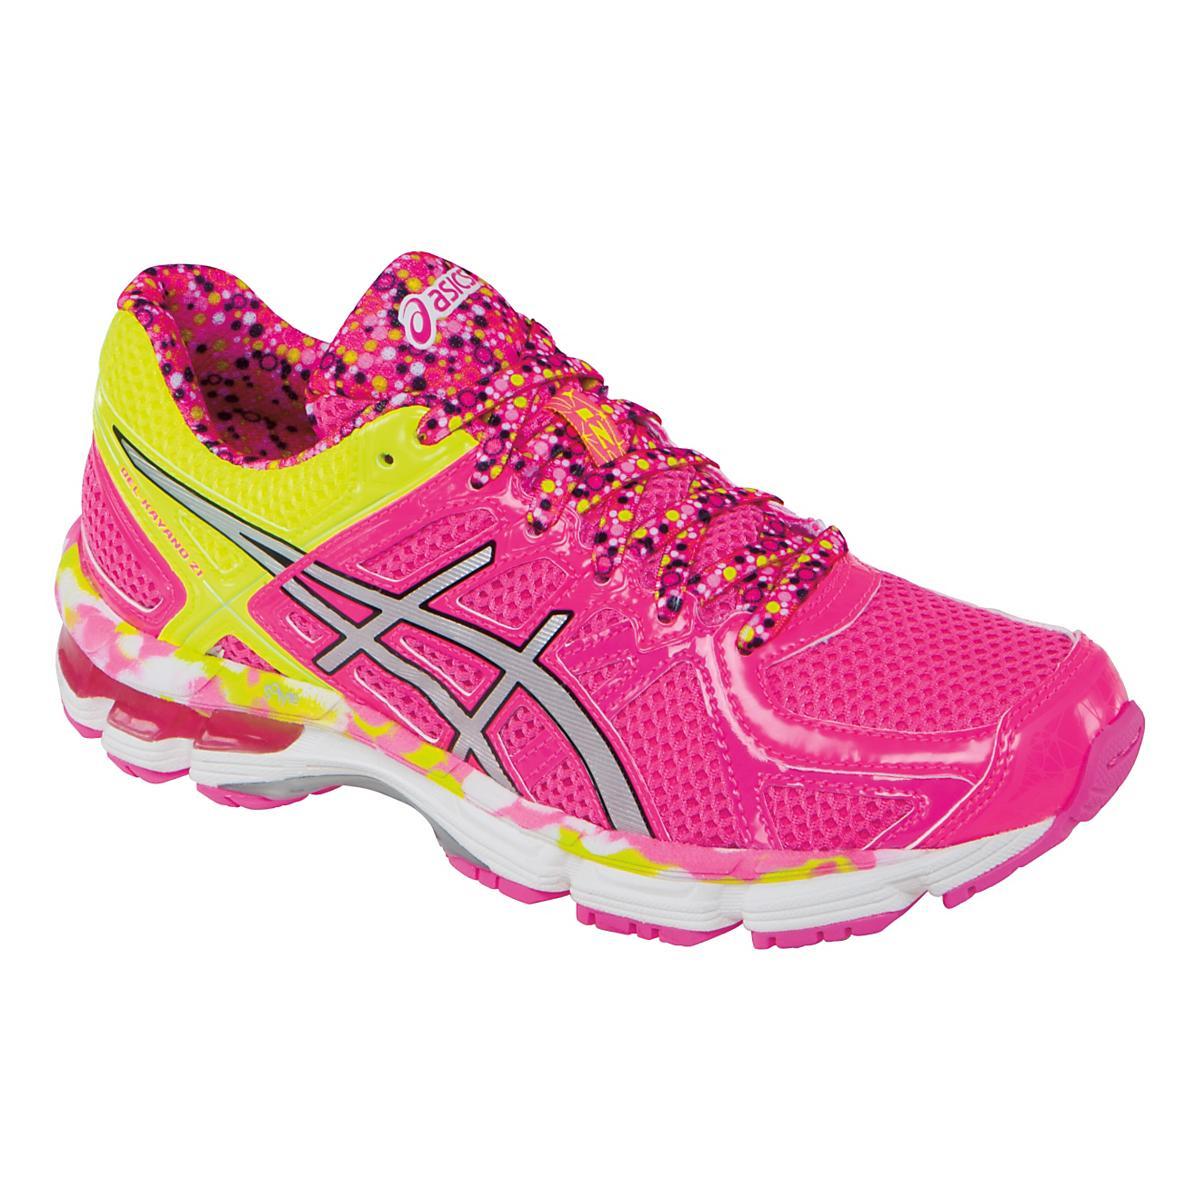 Kids ASICS GEL-Kayano 21 Running Shoe 8674d248a682